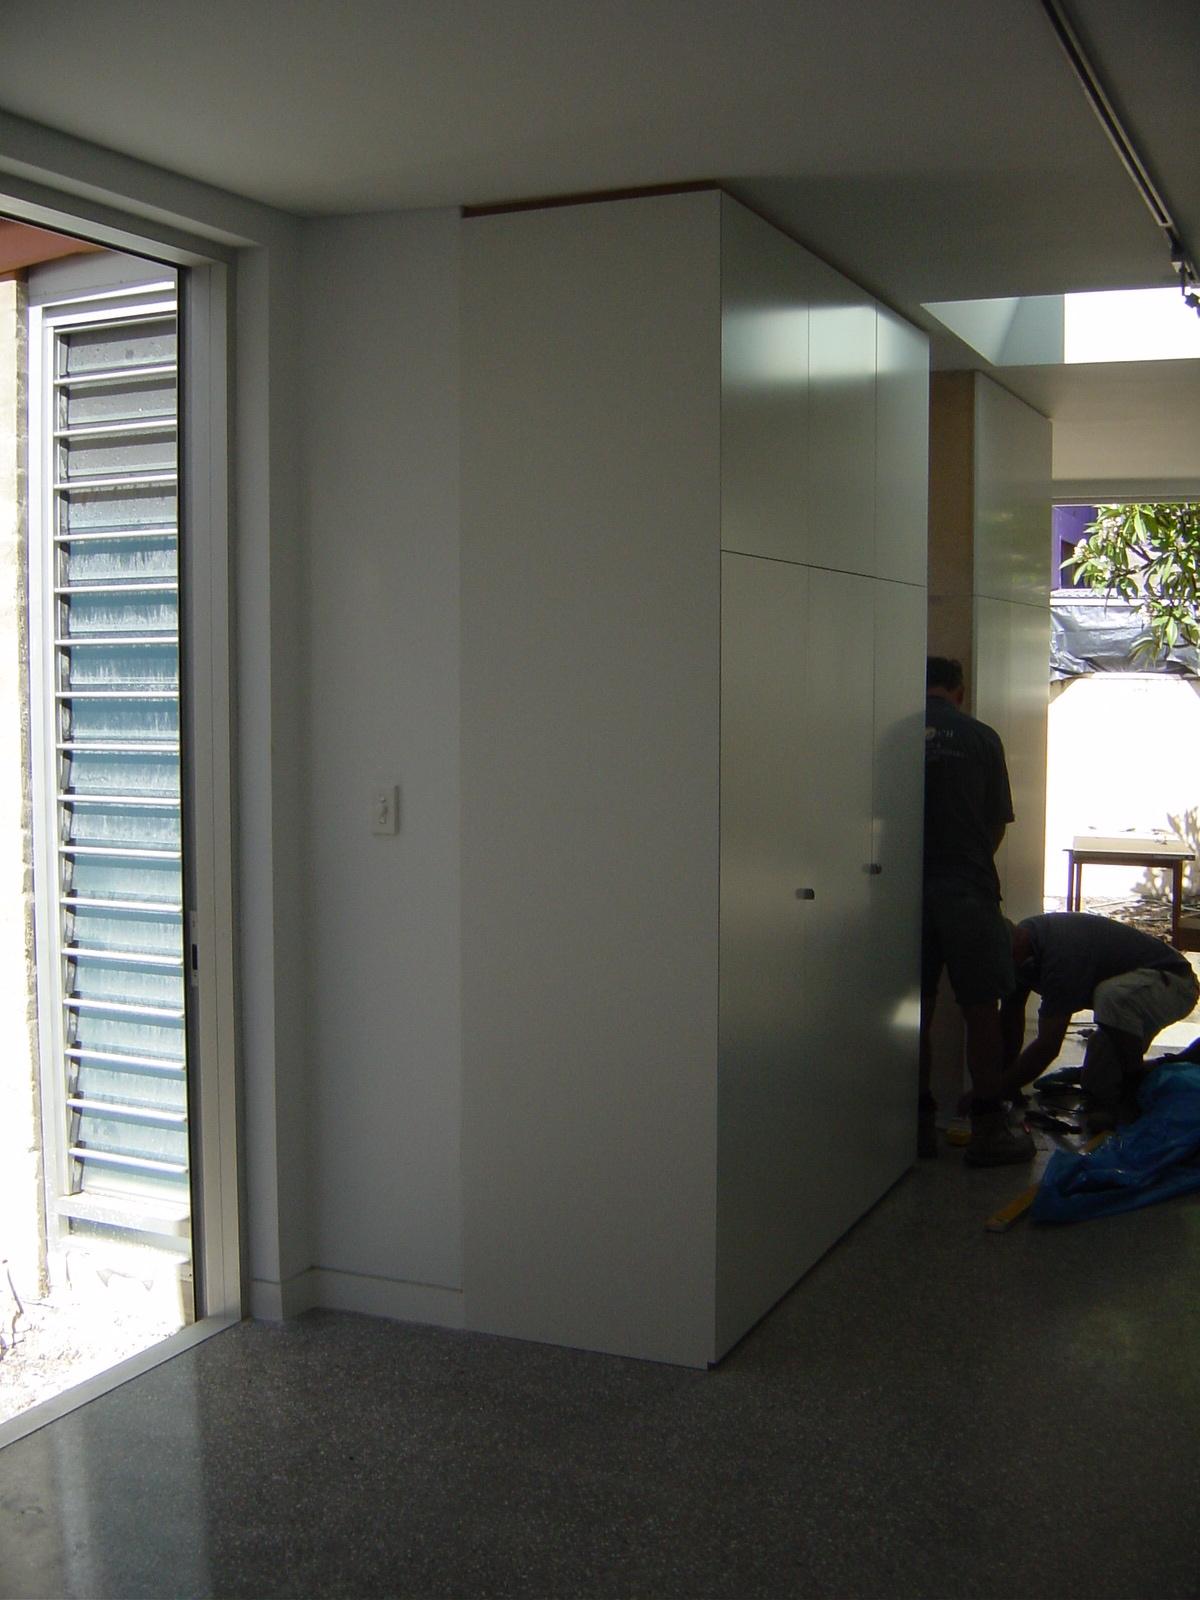 SydneyTerraceConstruction_03.JPG